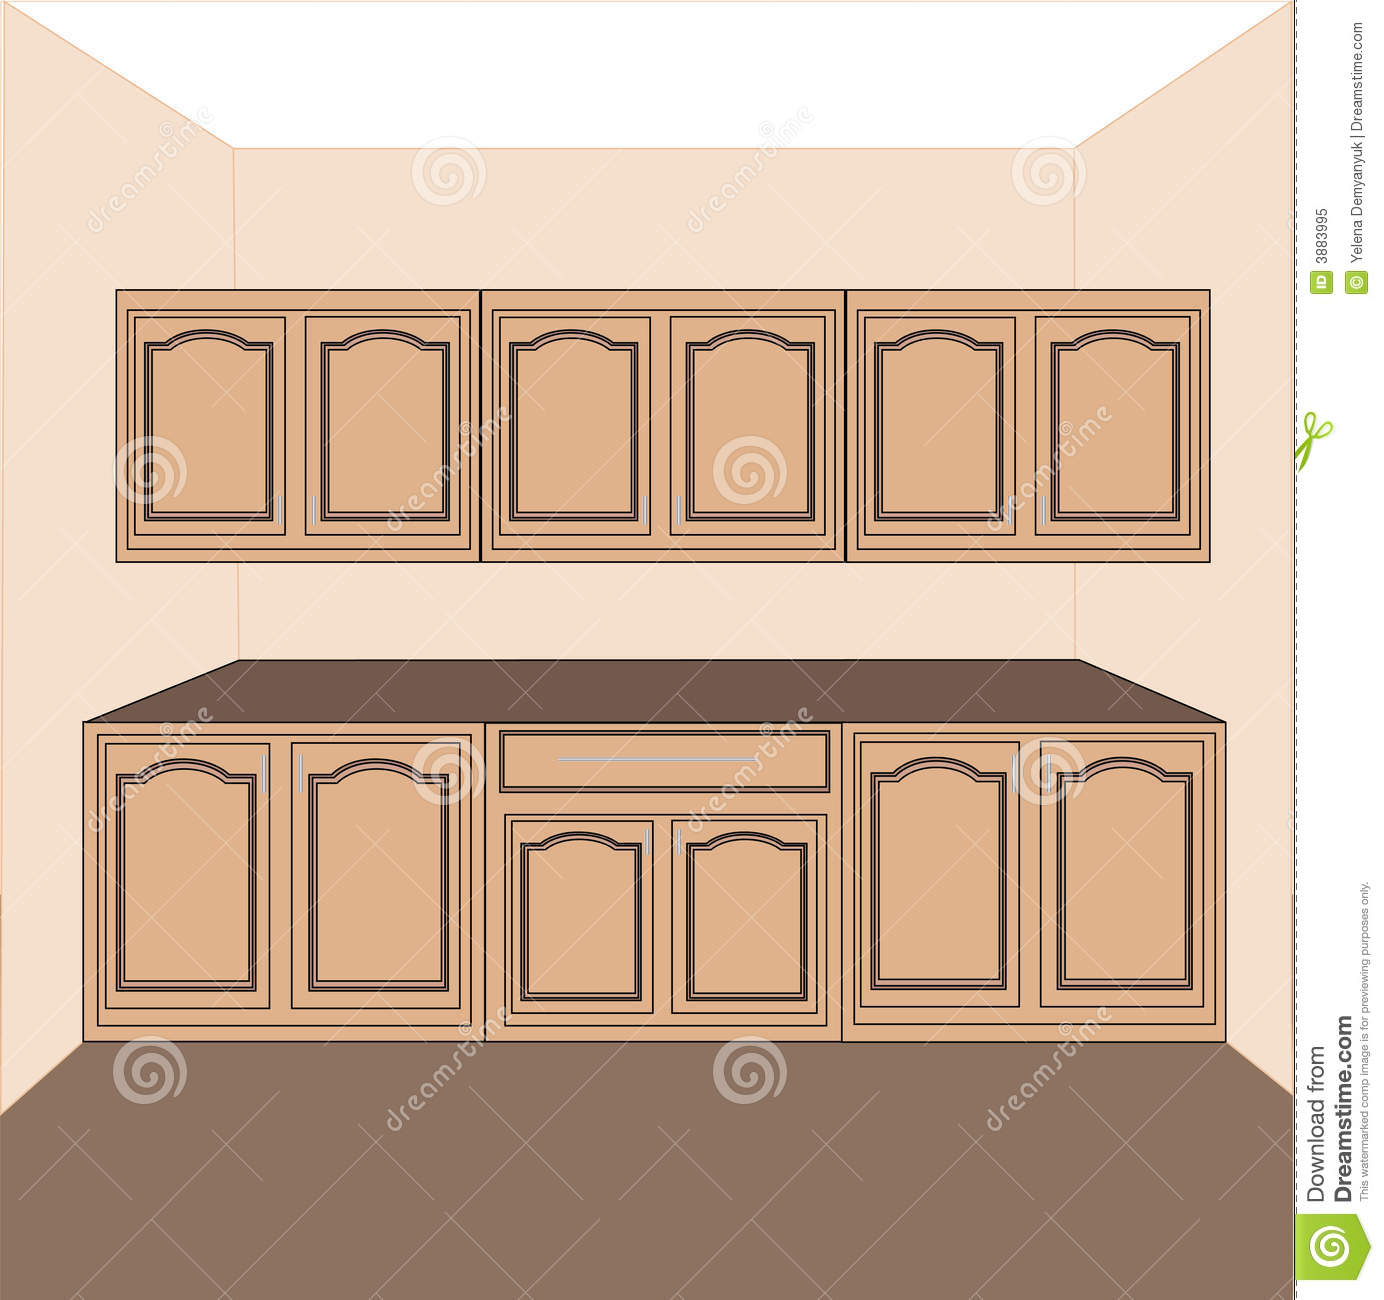 The Kitchen clipart kitchen cabinet Clipart kitchen Page Kitchen info